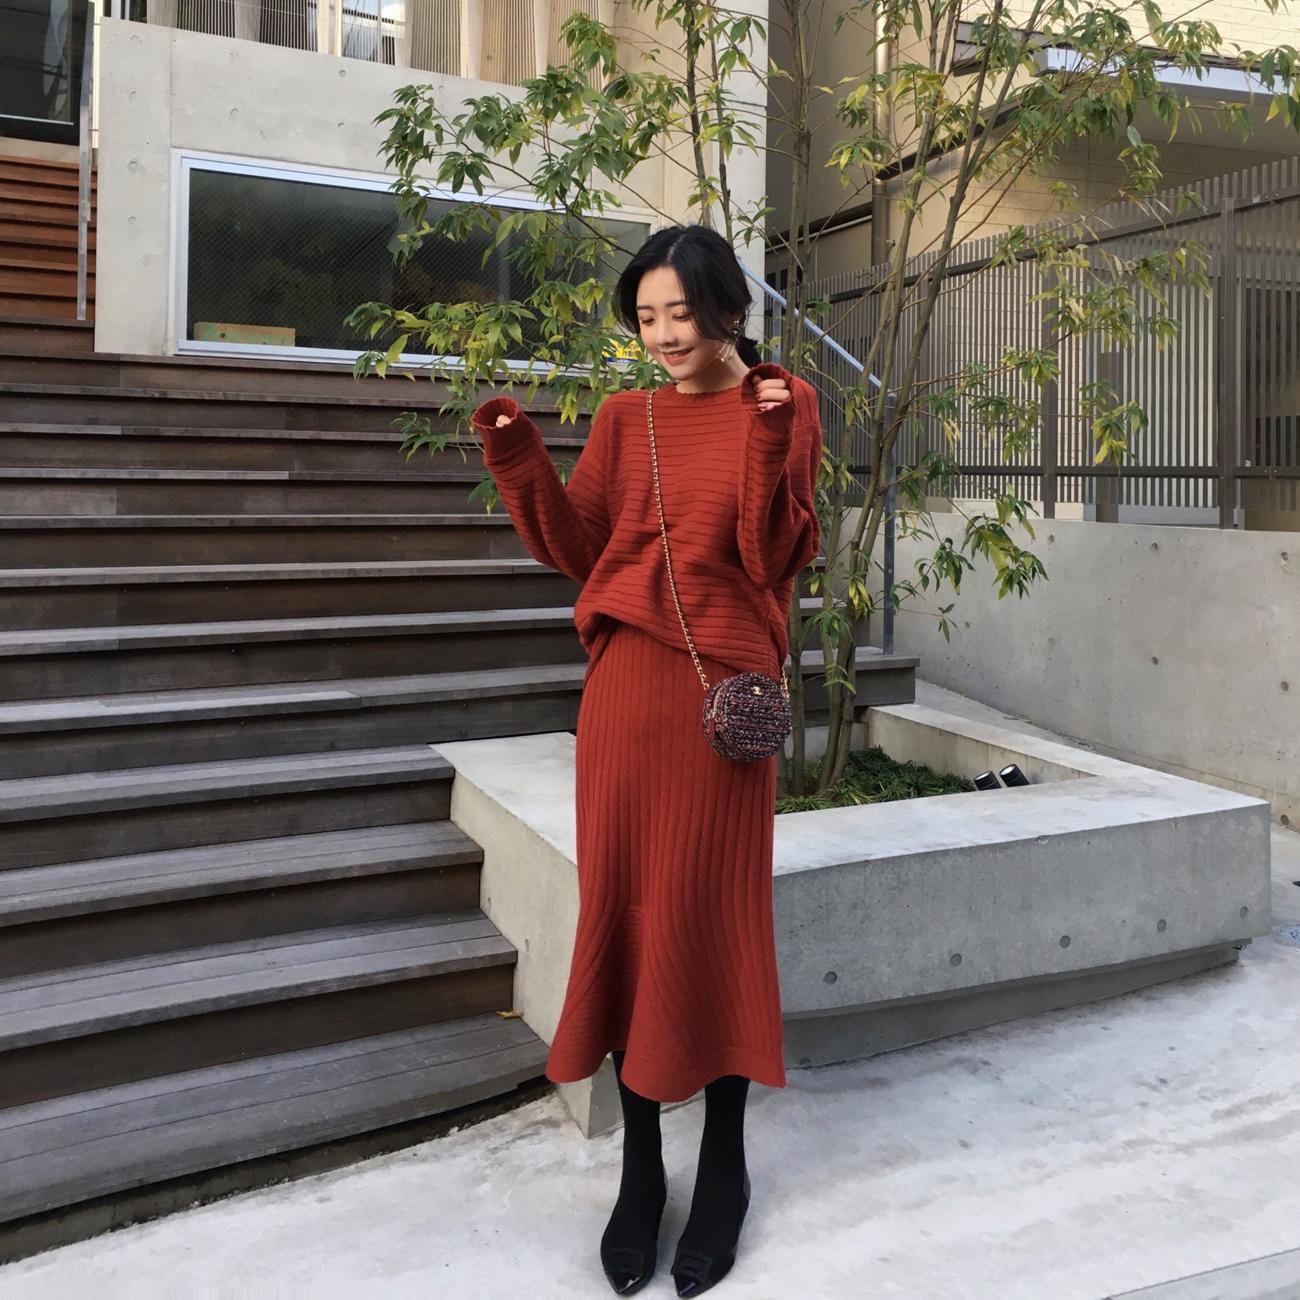 ◆ASM◆2018冬季新款包臀鱼尾裙半身裙圆领套头毛衣针织套装女装